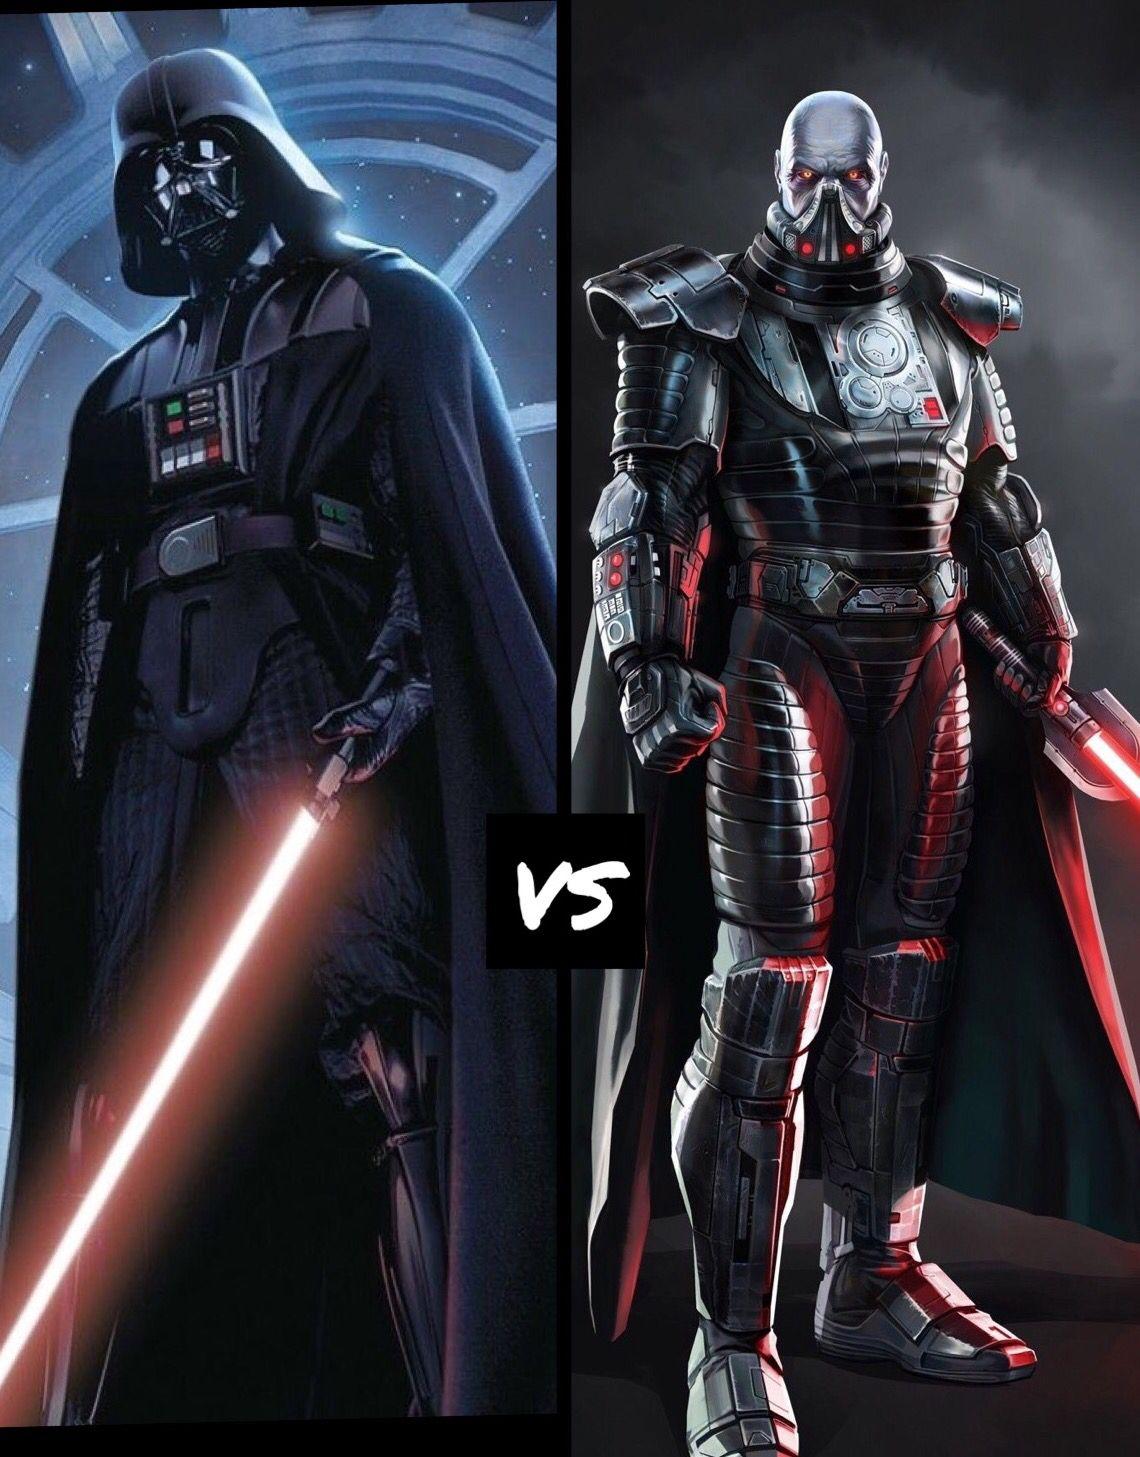 https://i.pinimg.com/originals/0a/6c/ec/0a6cec85e753e197121df5e7463fa898.jpg Darth Malgus Vs Darth Vader